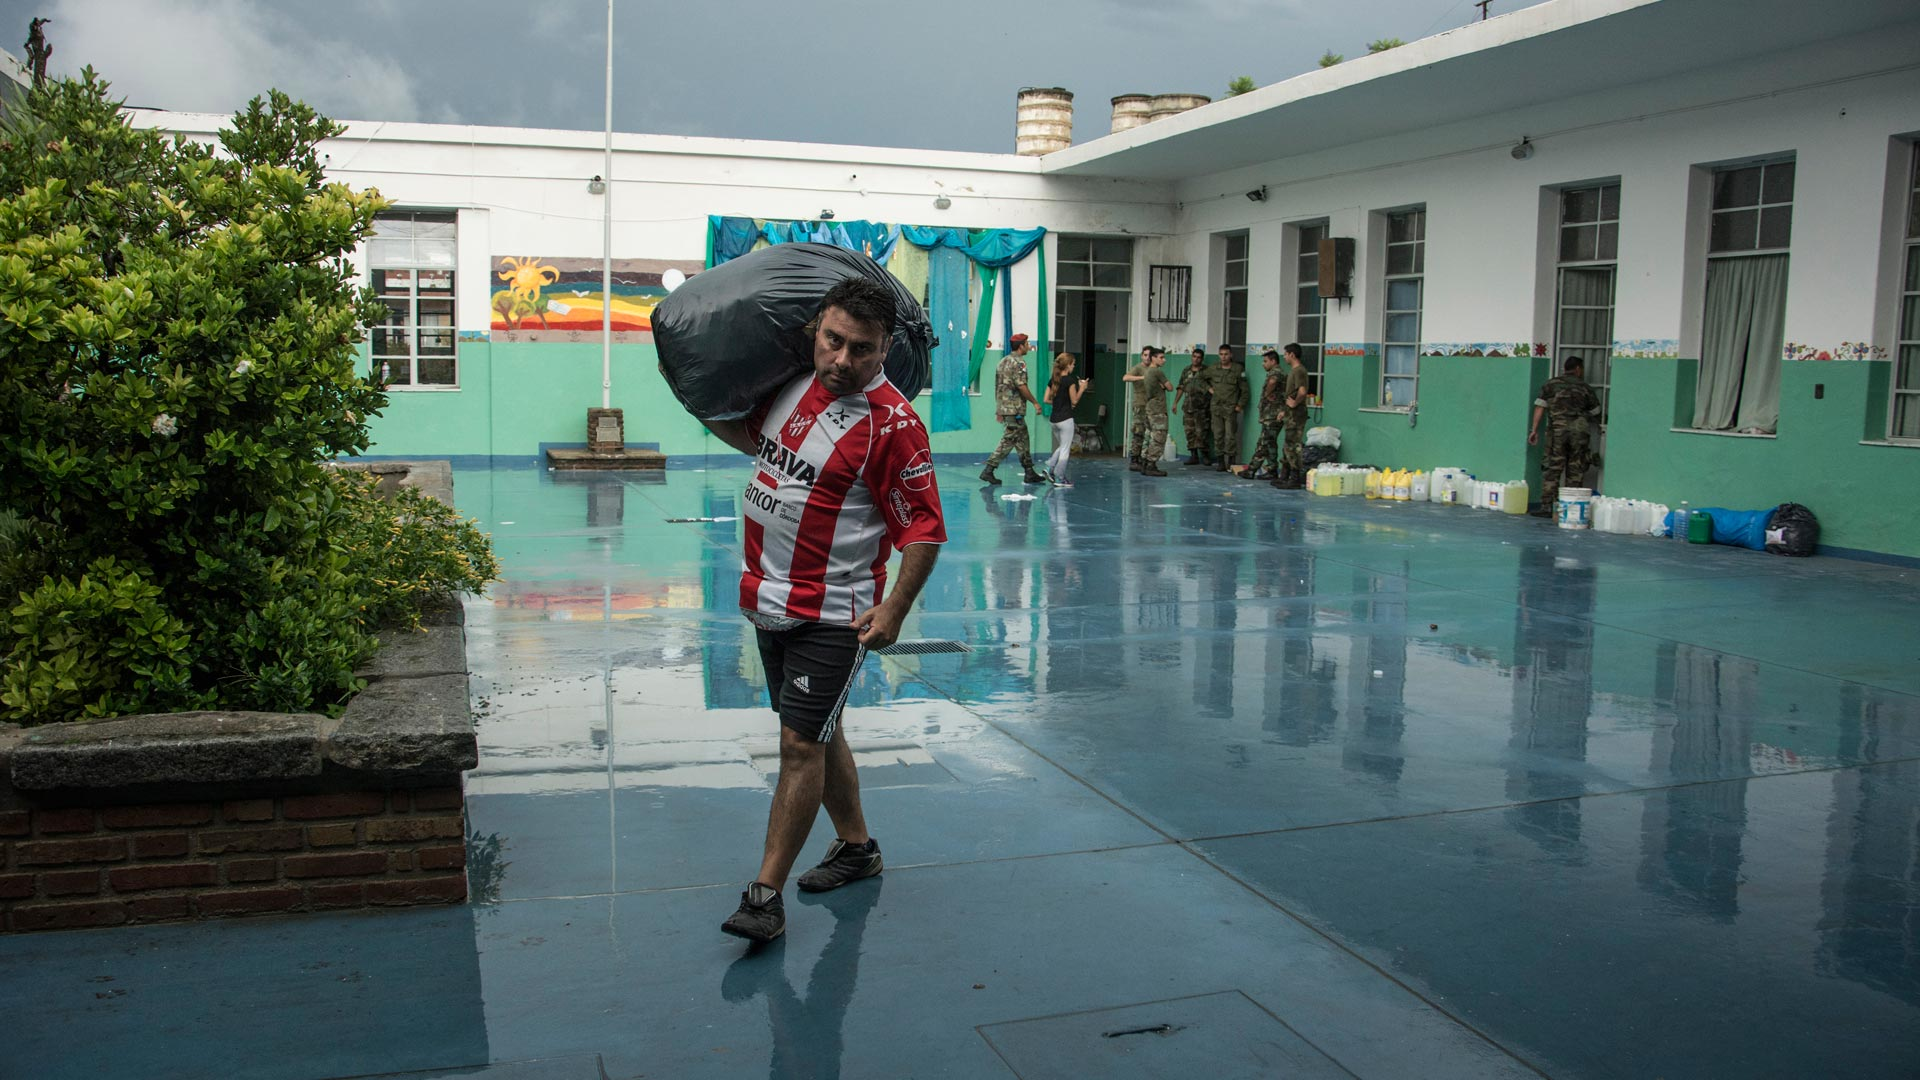 inundaciones_cordoba_manifiesto_5_caja